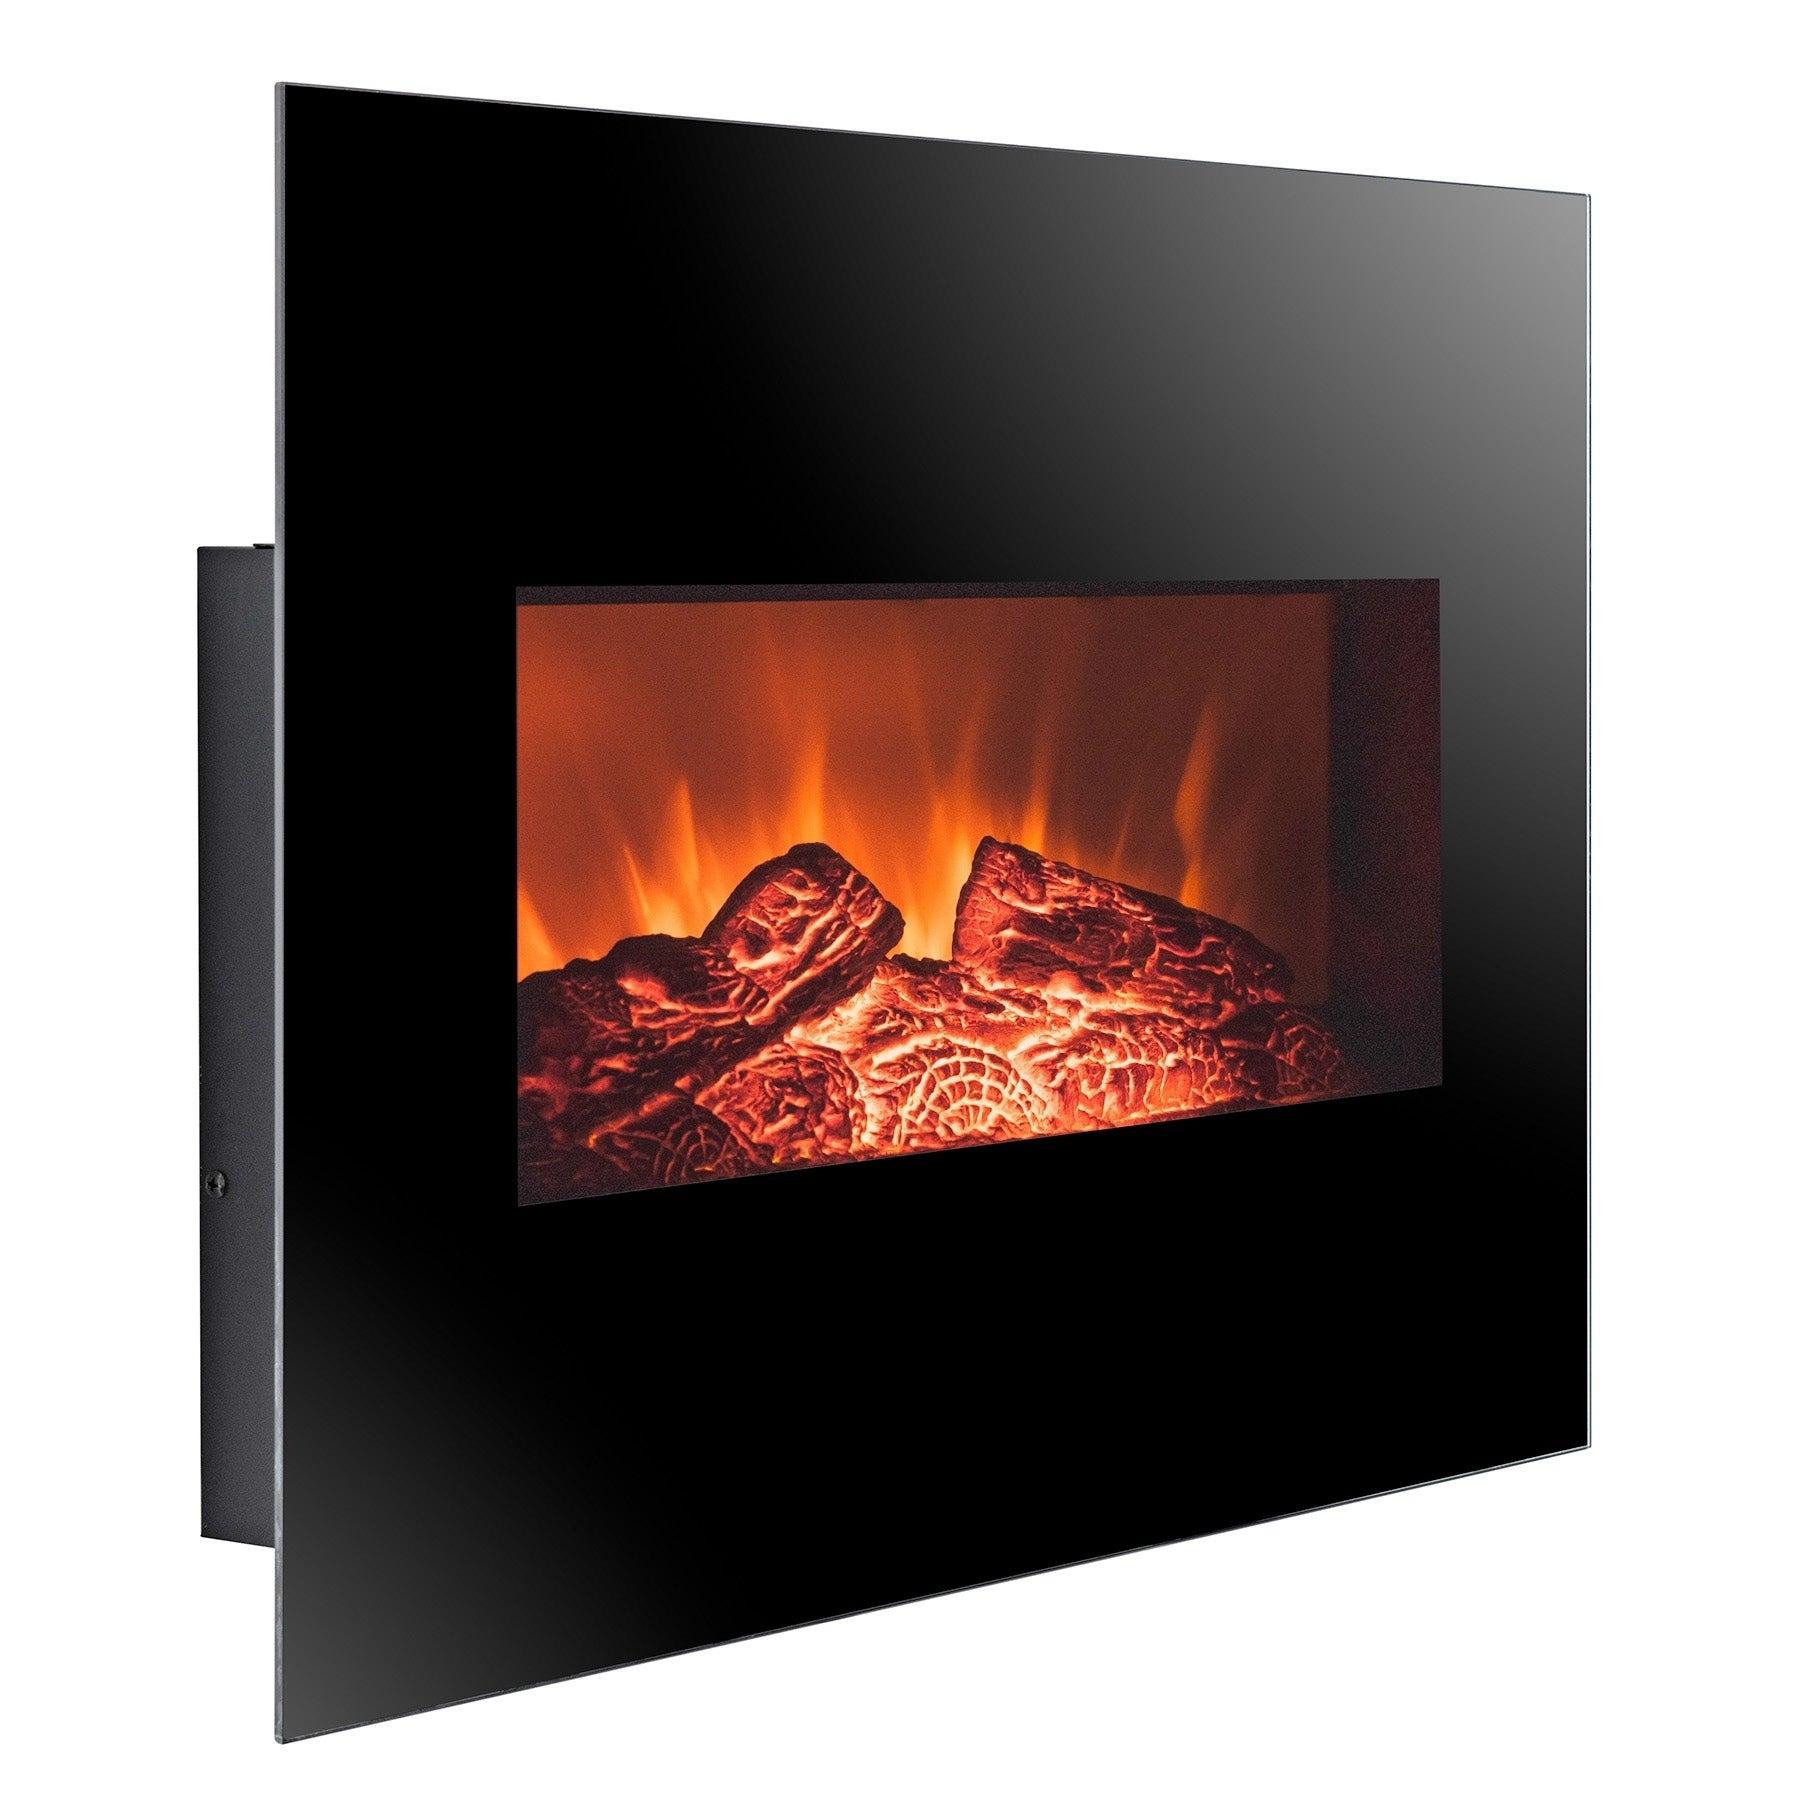 Golden Vantage FP0063 26 Wall Mount Electric Fireplace 3D Flames Firebox w Logs Heater 12f6 4229 b810 f229bad65c62